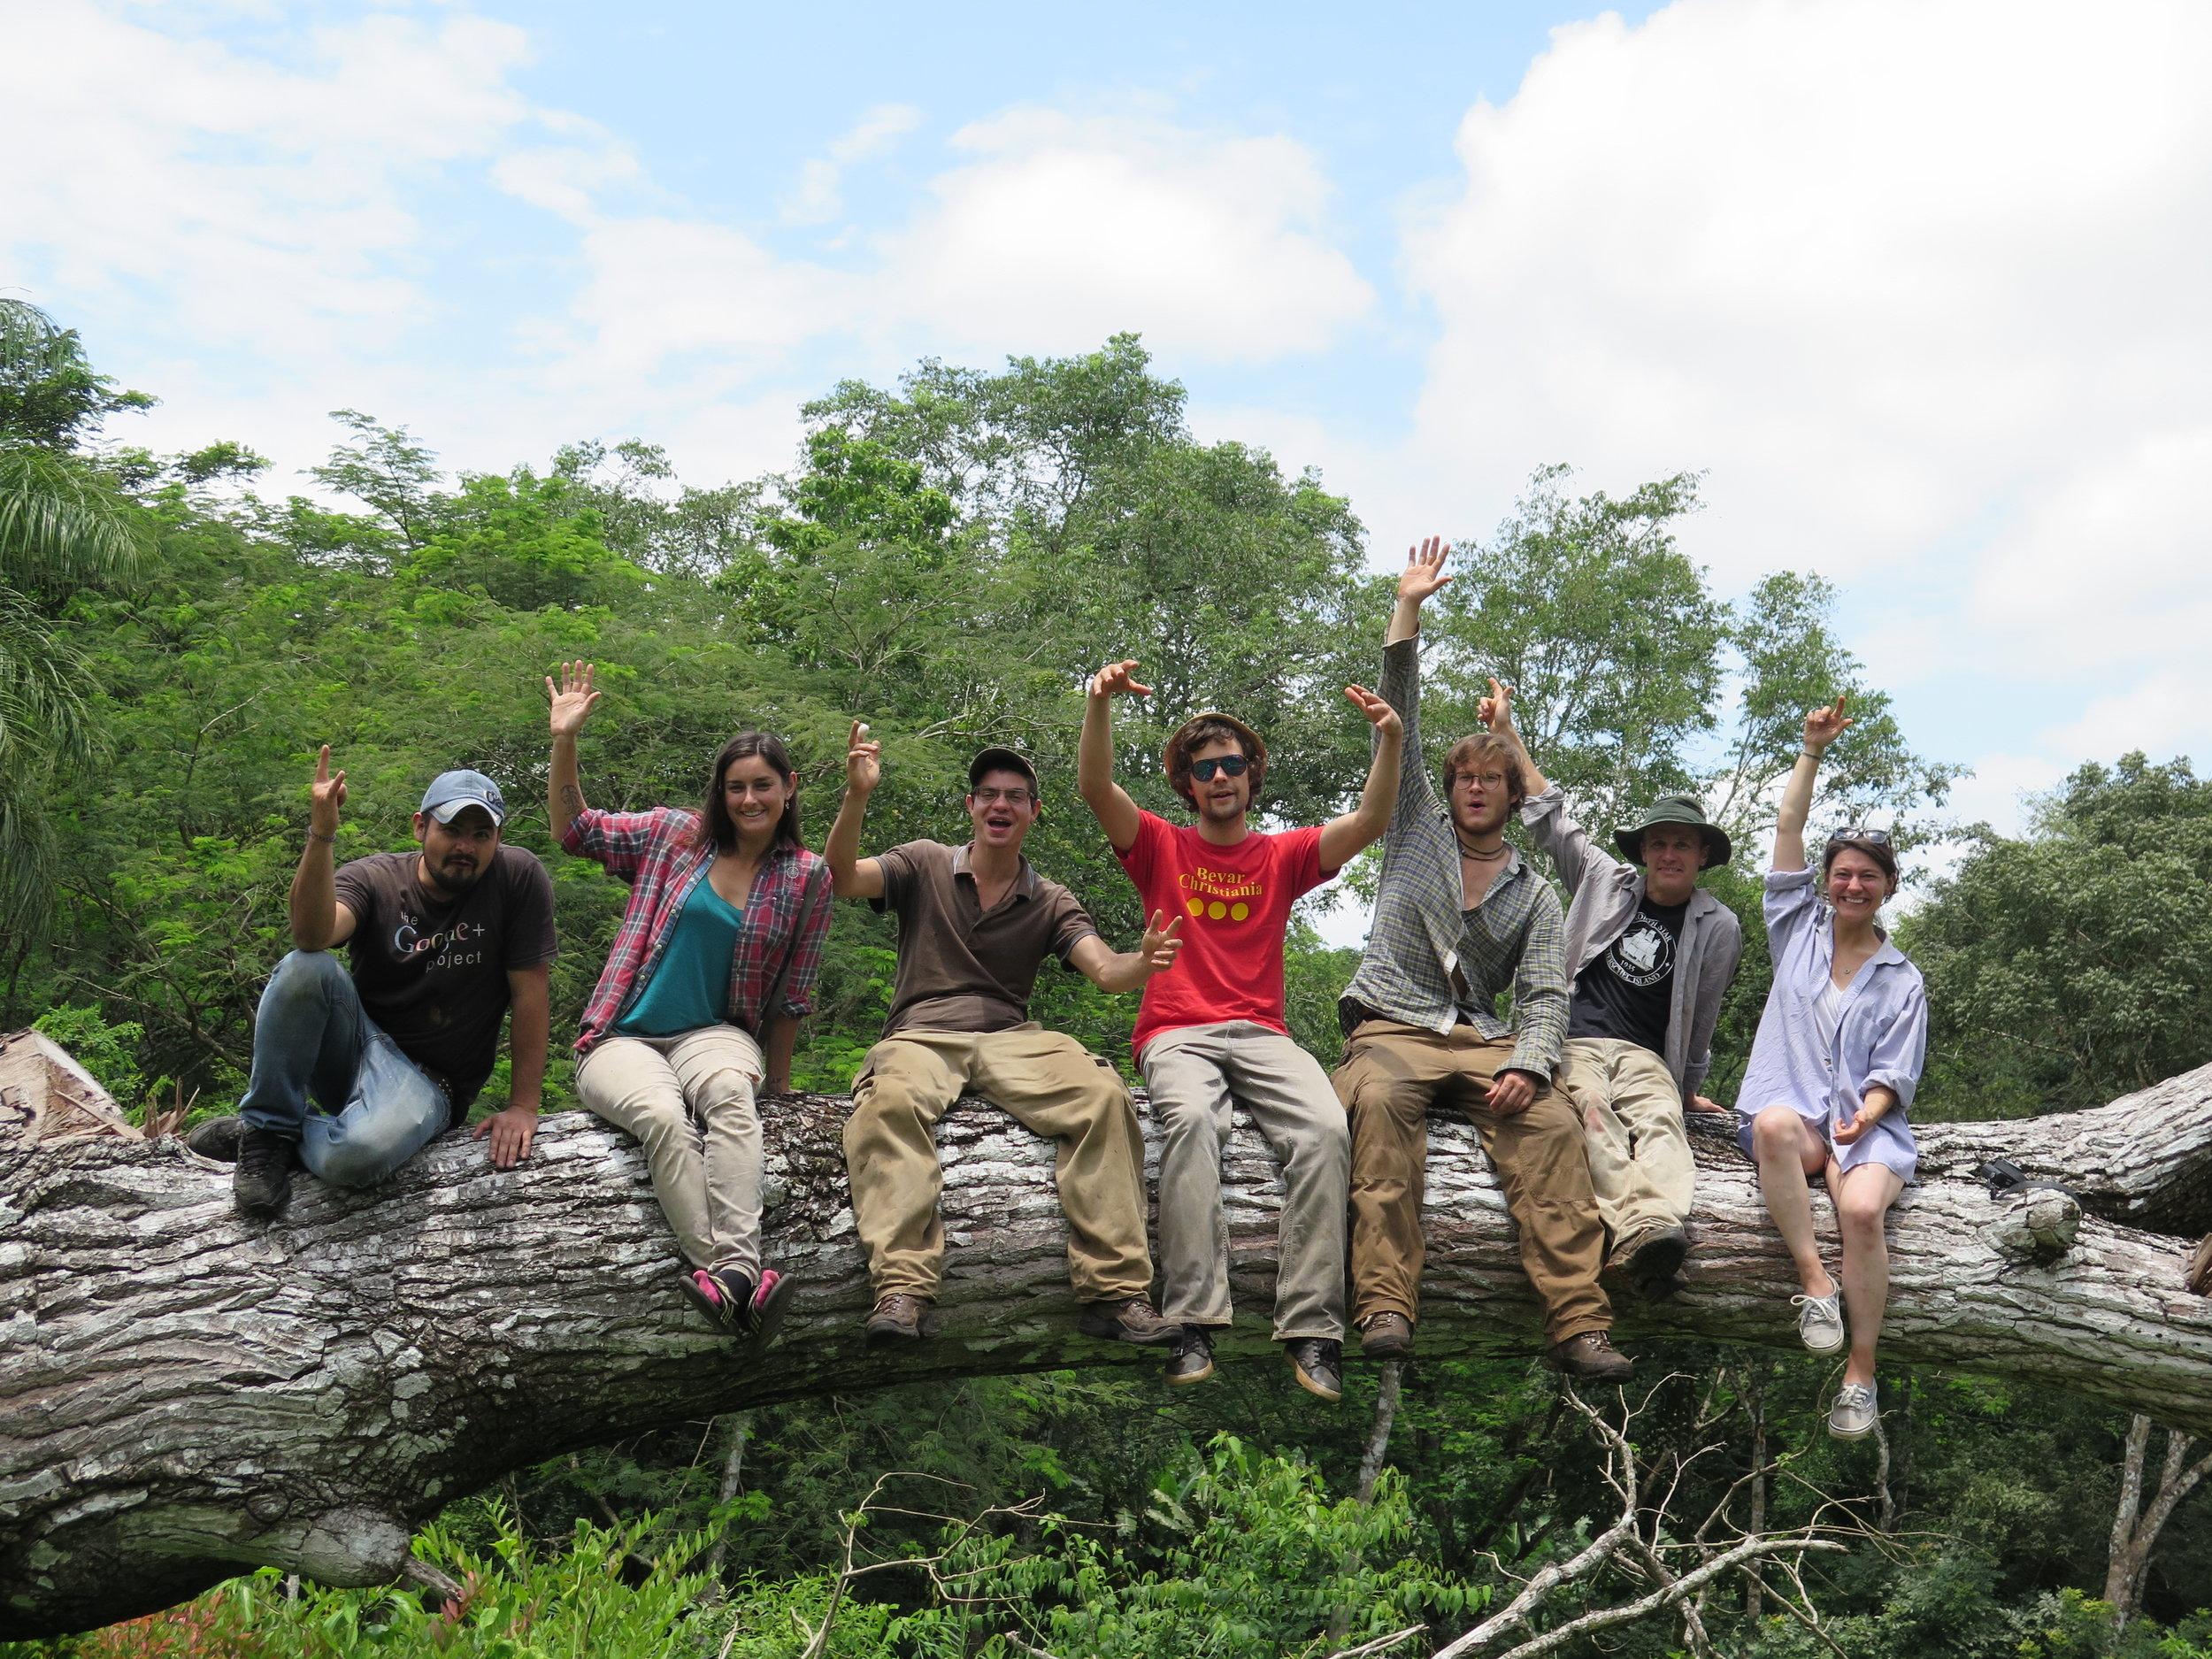 Location: La Pita, Guicimal  Our team visiting the site where our Spanish Cedars (Cedro Amargo) were sourced.  From Left: Paolo, Danielle, Yannick, Ville, Gero, Lynx & Natassia.